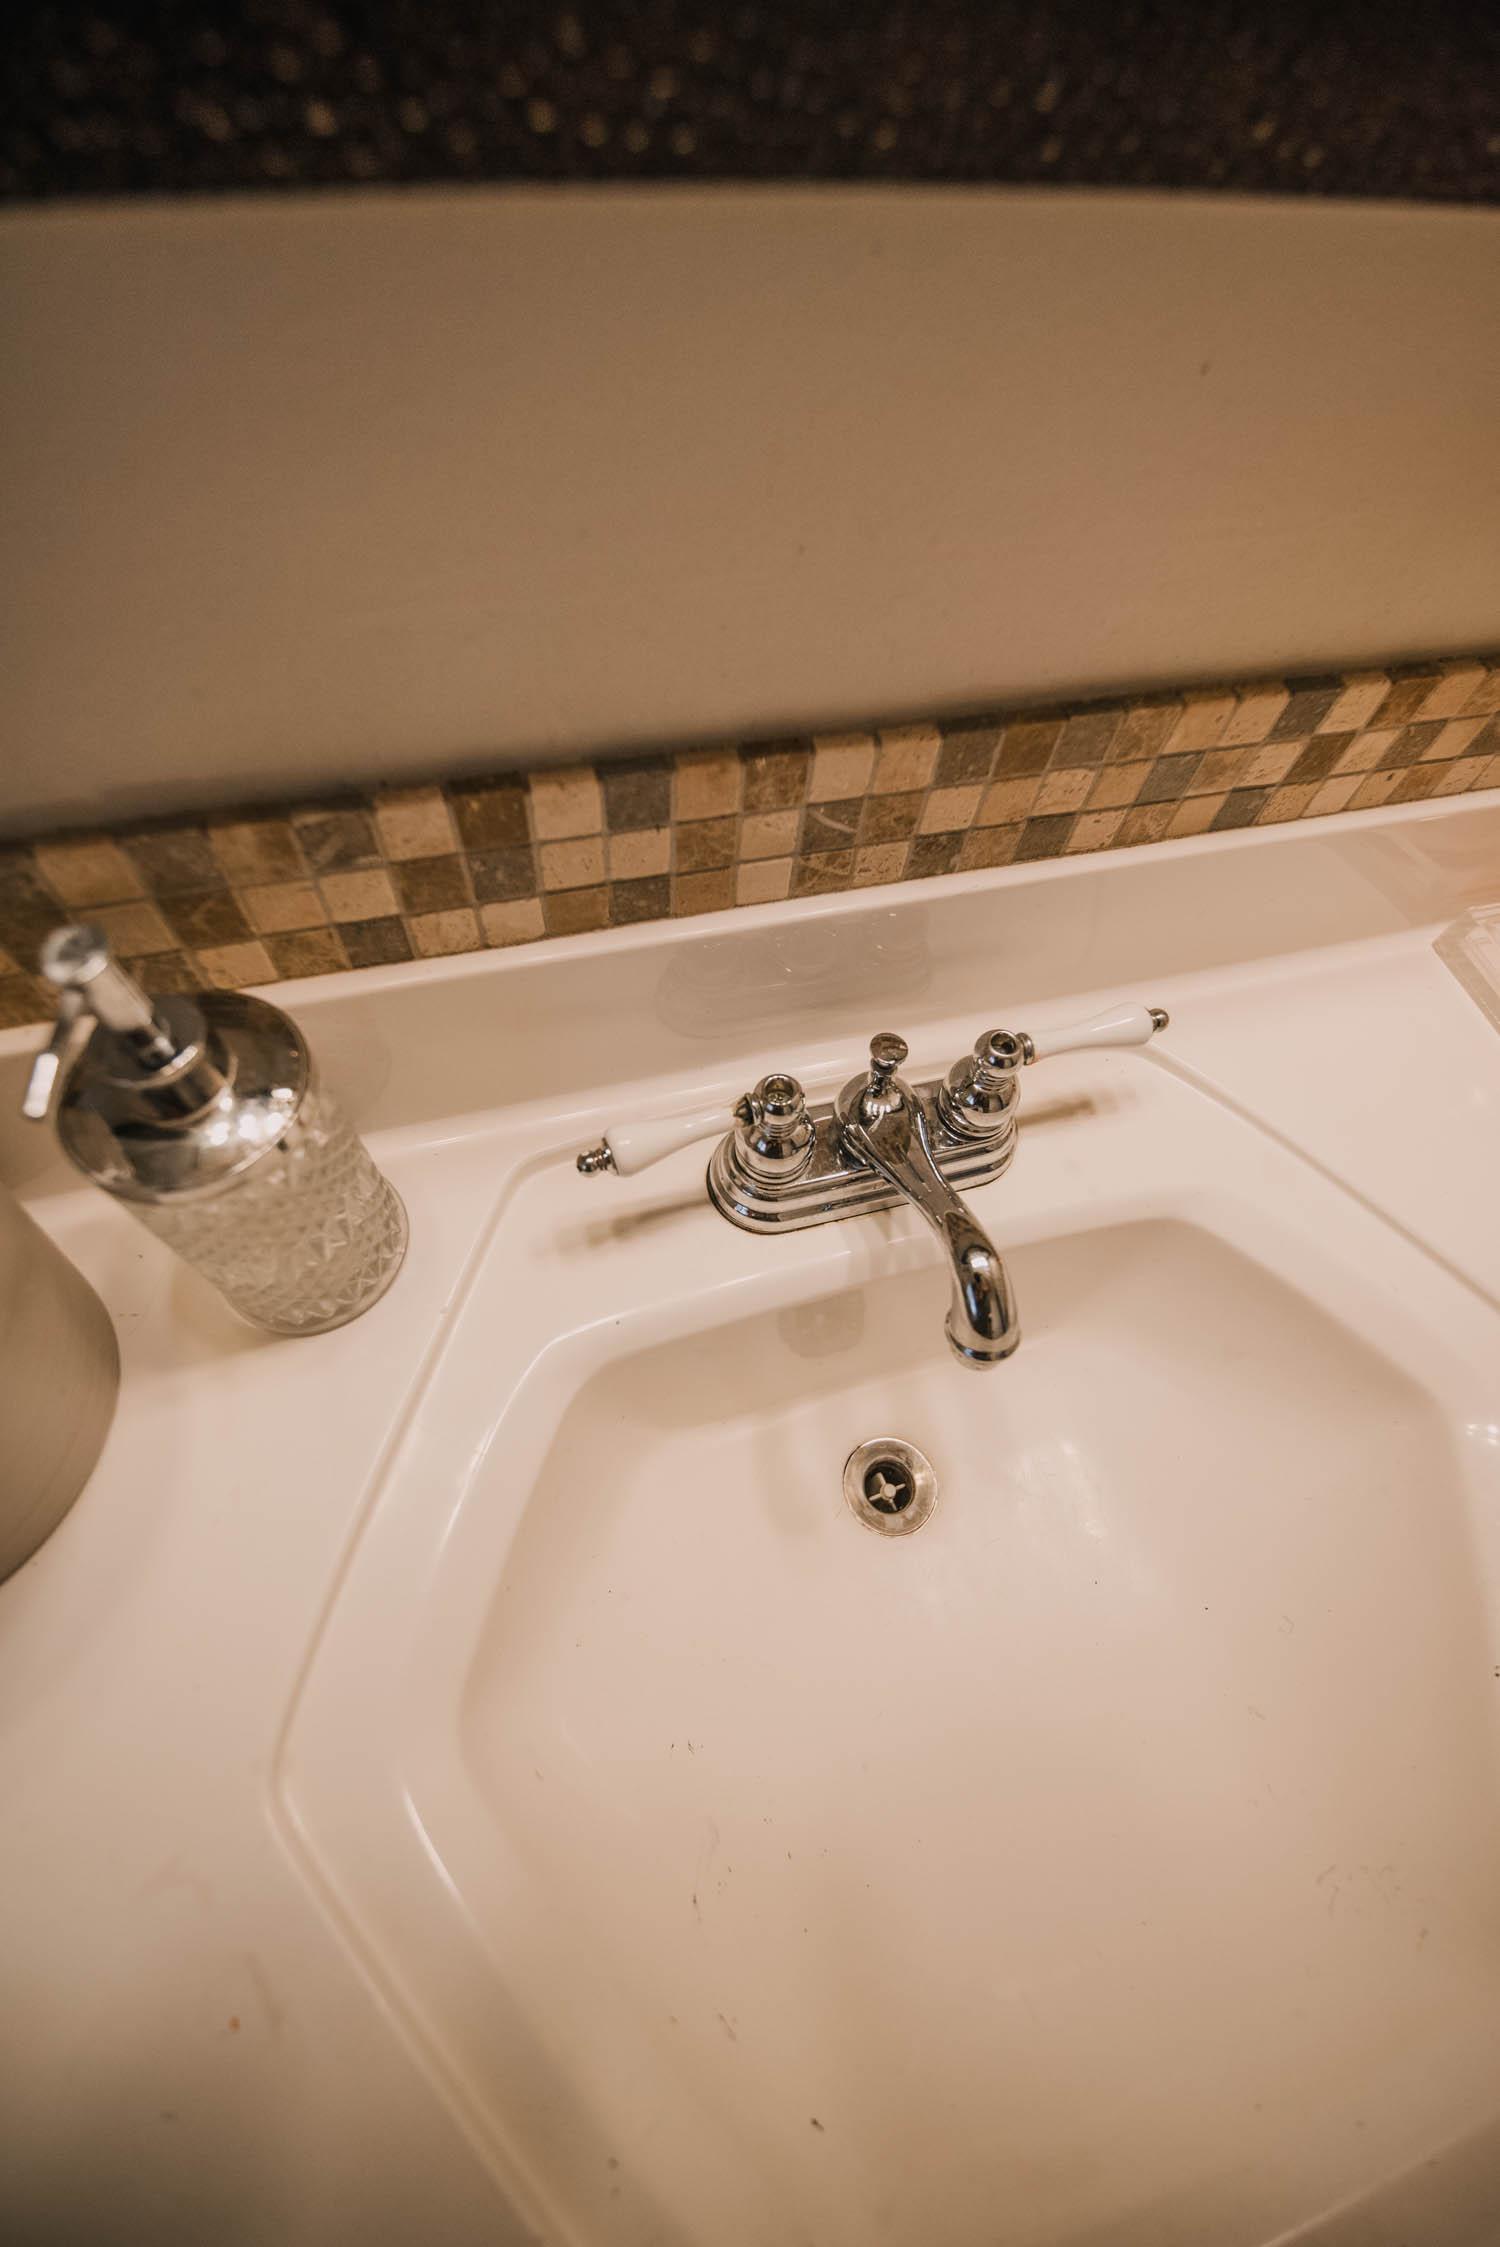 Dated bathroom remodel plans